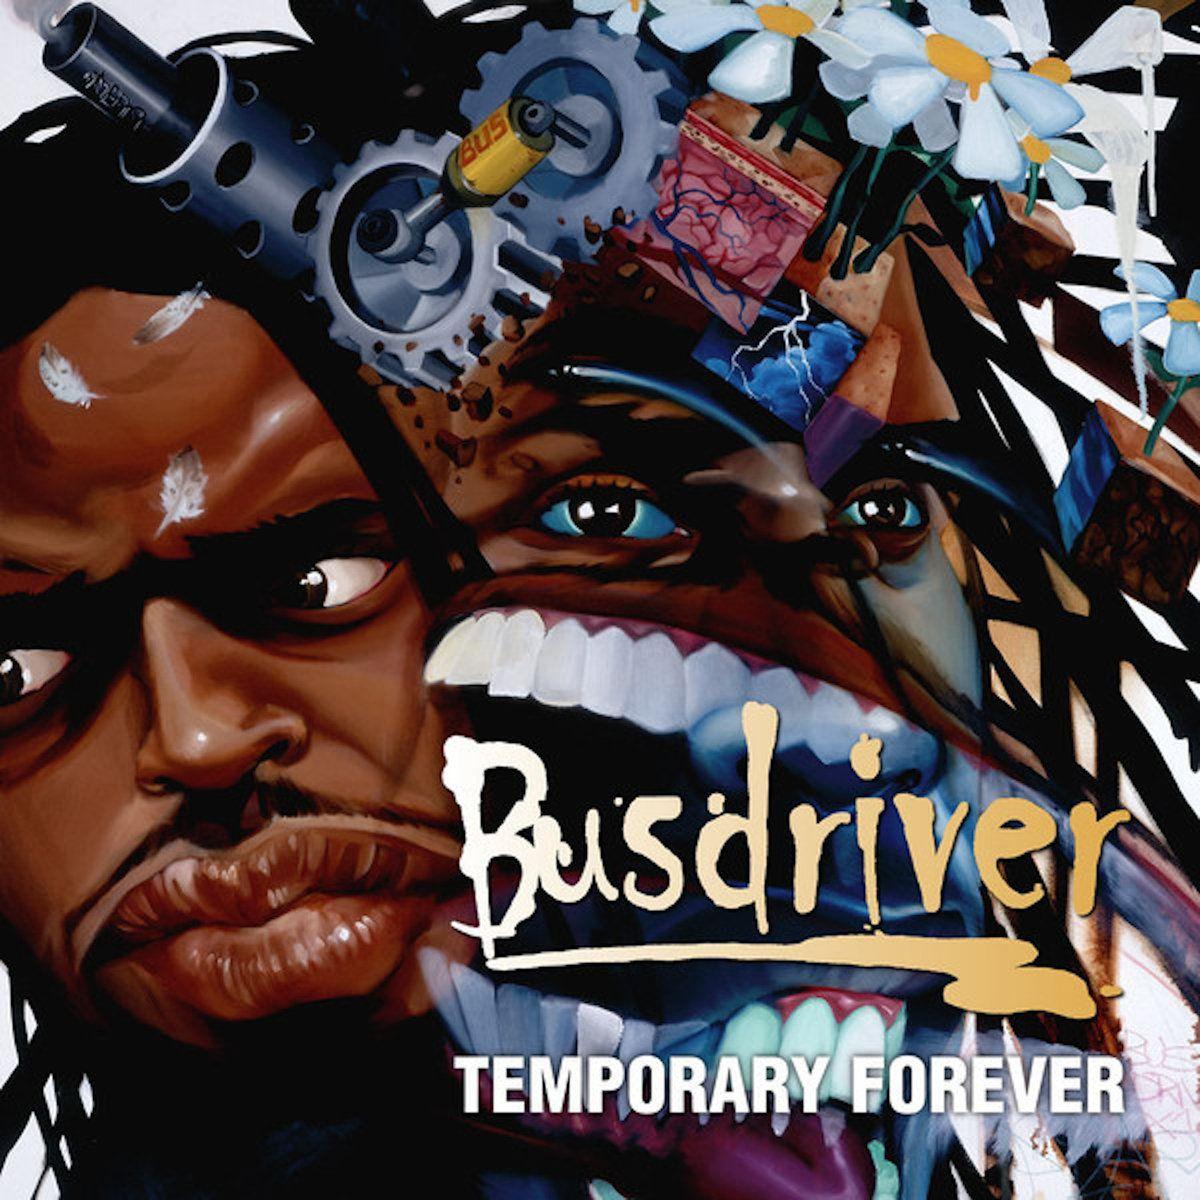 Busdriver Temporary Forever 1200x1200 Songs Hip Hop Albums Forever